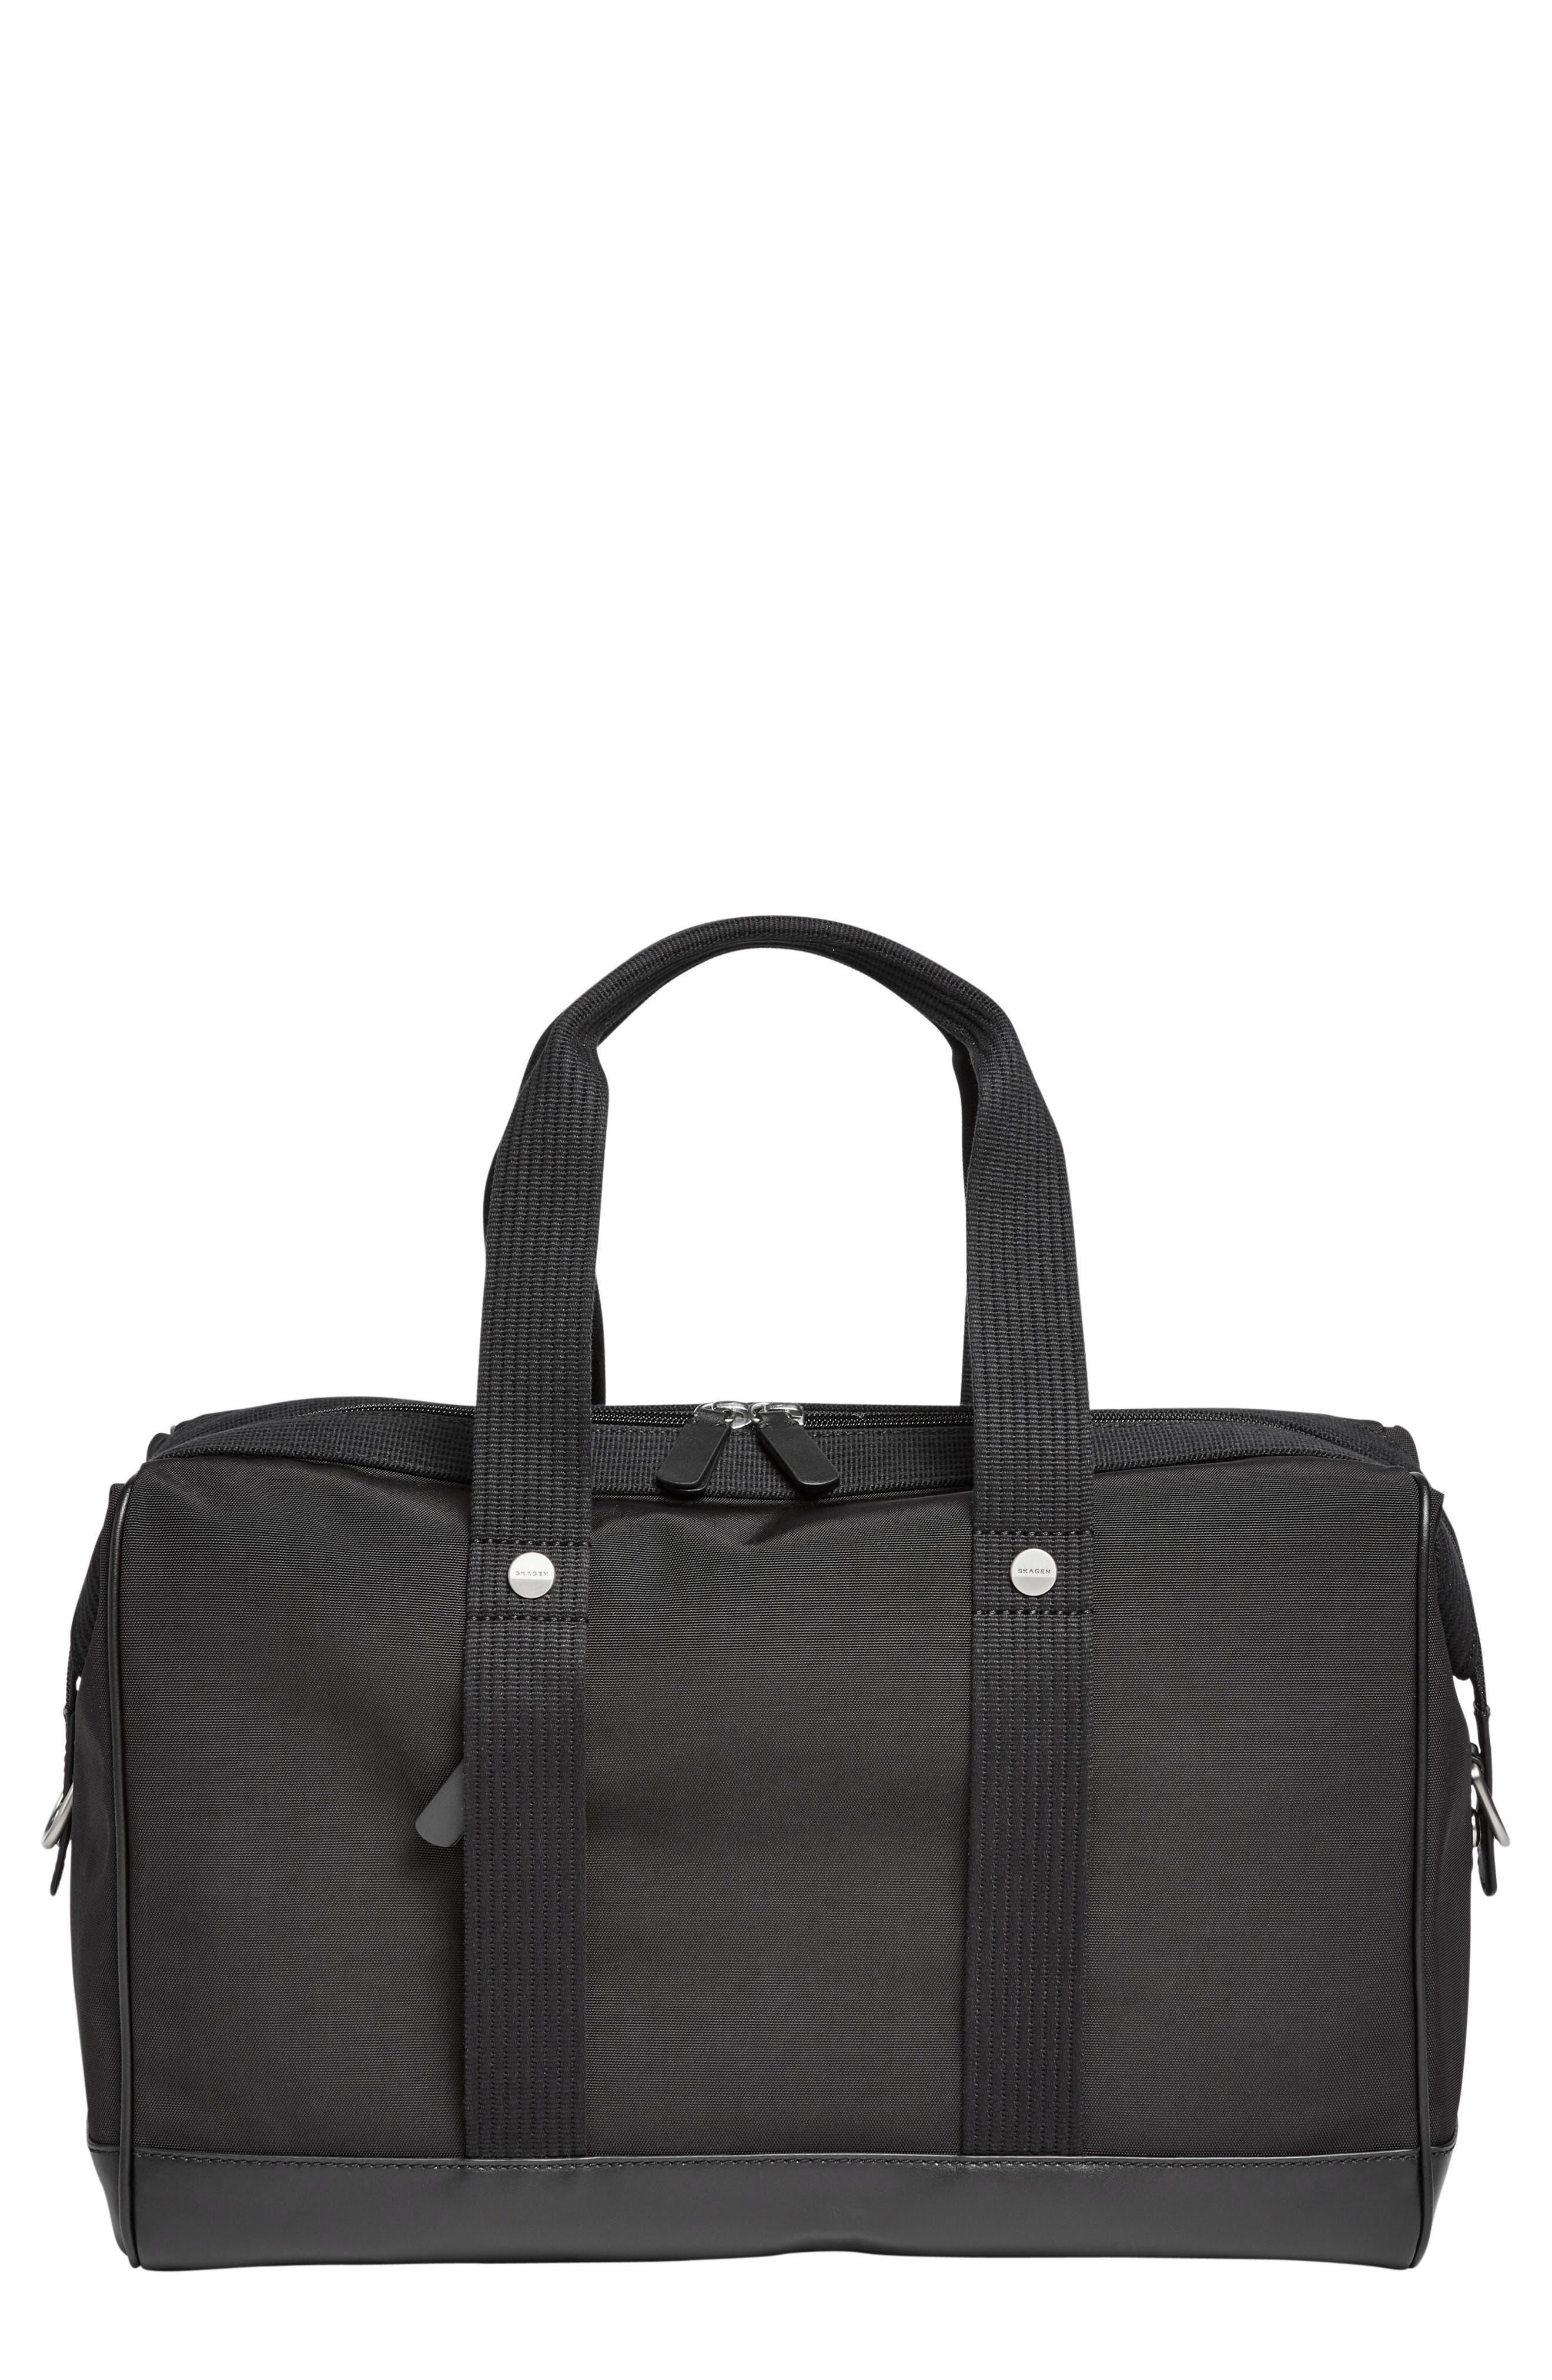 Krinsen Duffel Bag,                             Main thumbnail 1, color,                             Black